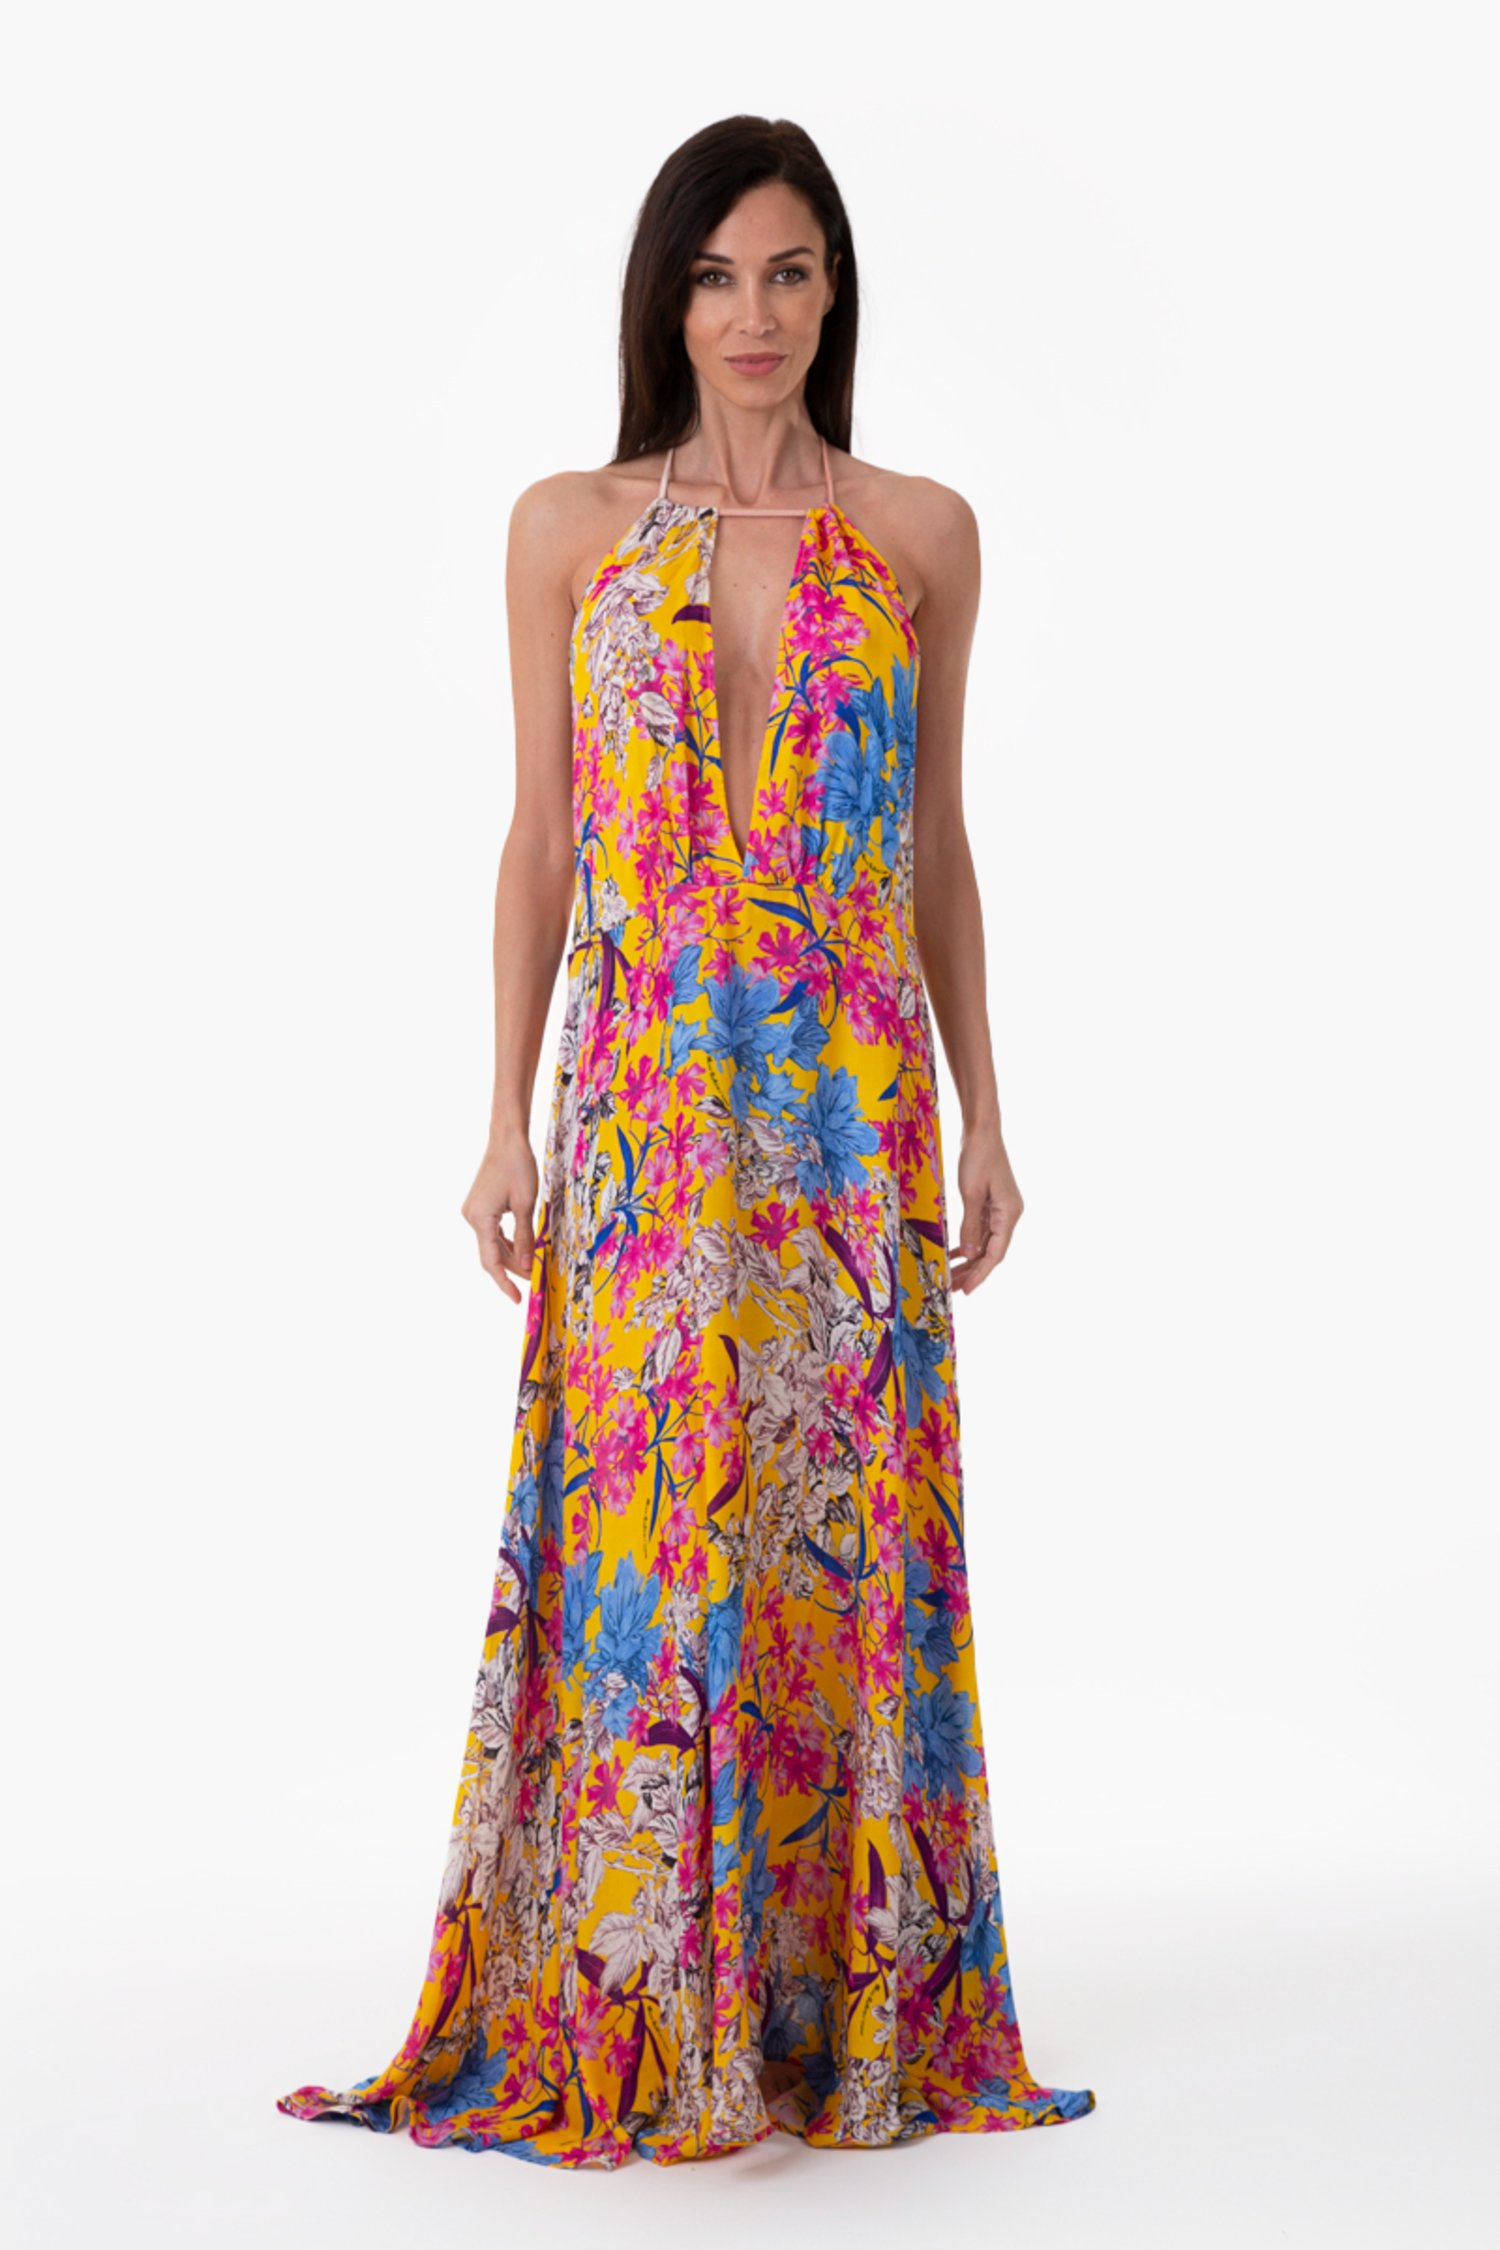 LUXE PRINTED LONG DRESS - Fiori Giallo